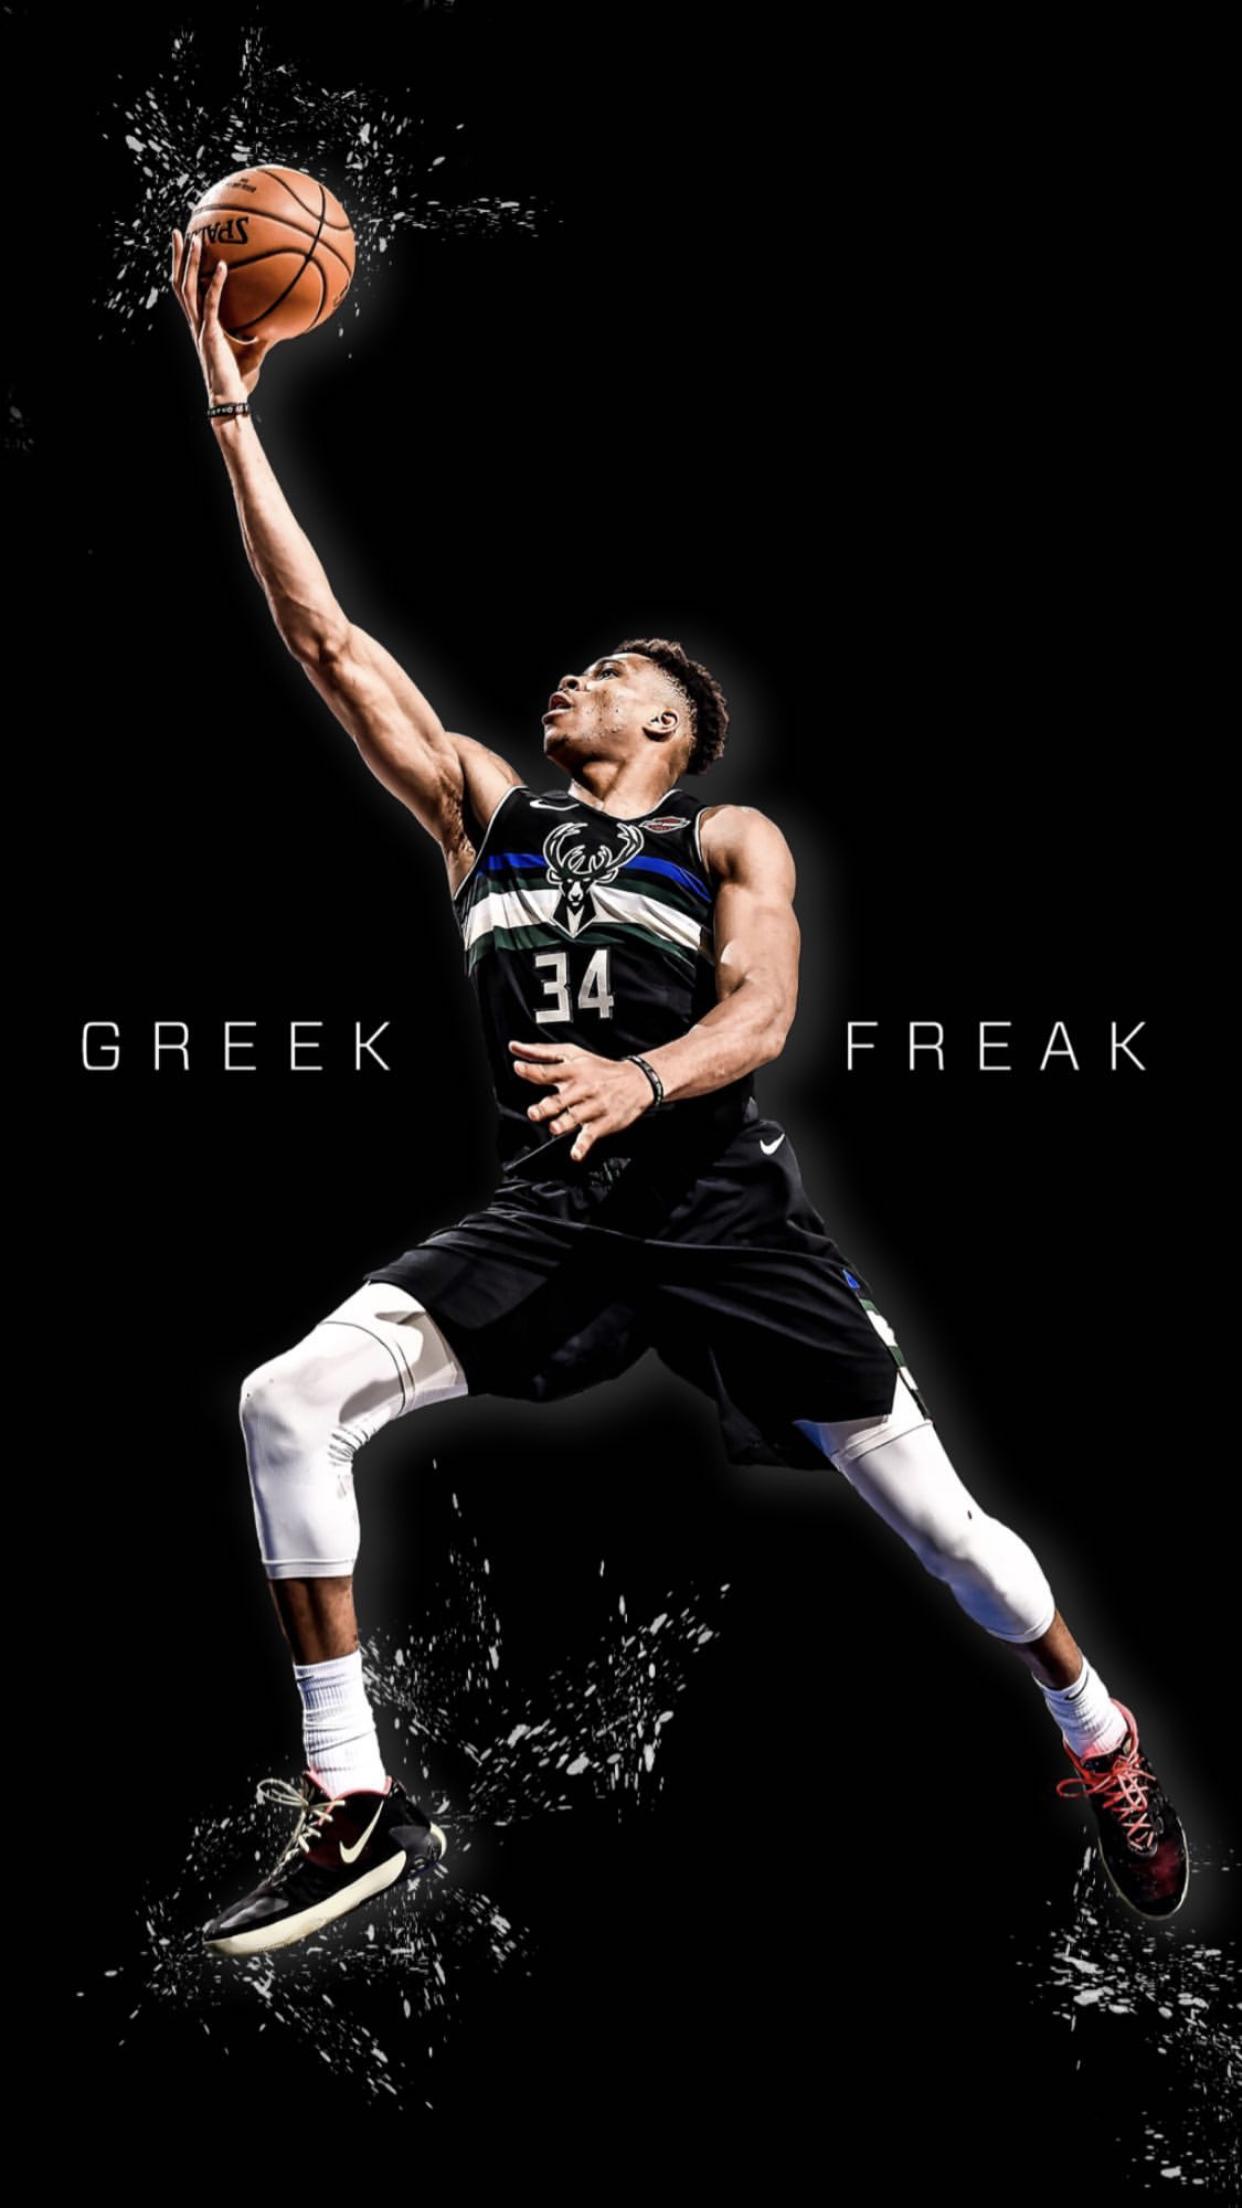 greek fr34k🦌 in 2020 | Giannis antetokounmpo wallpaper ...